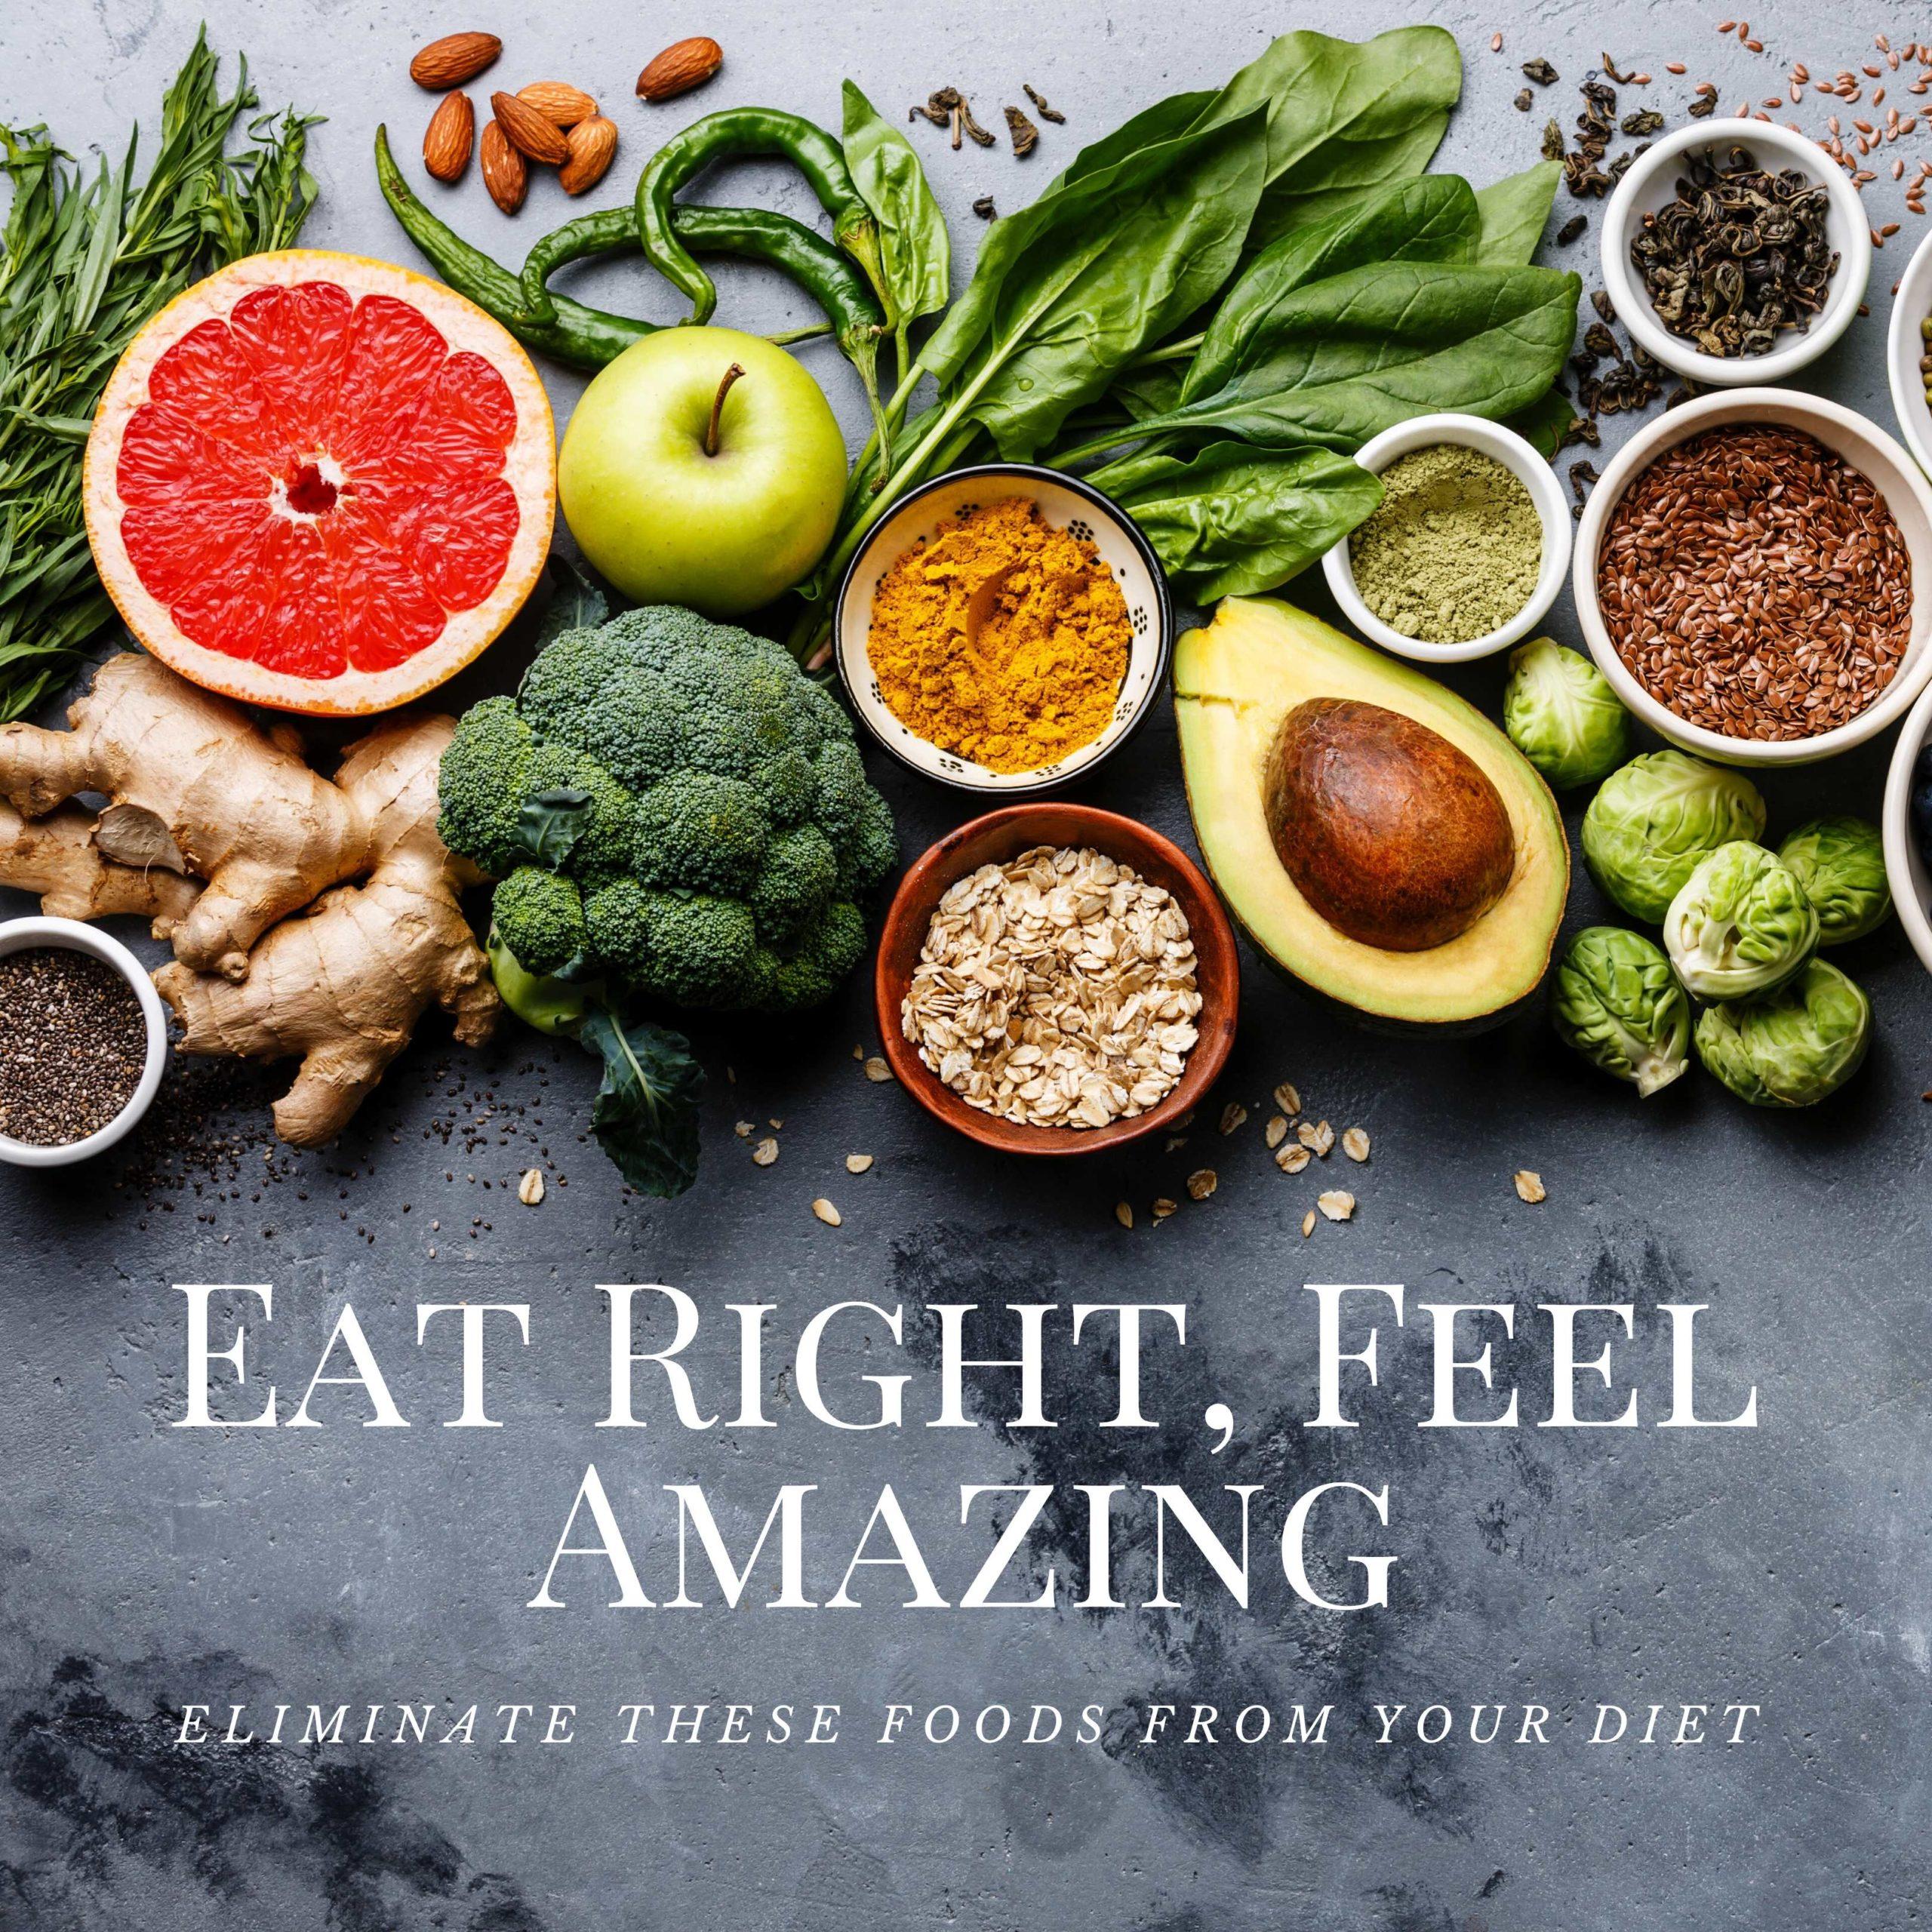 Eat Right, Feel Amazing